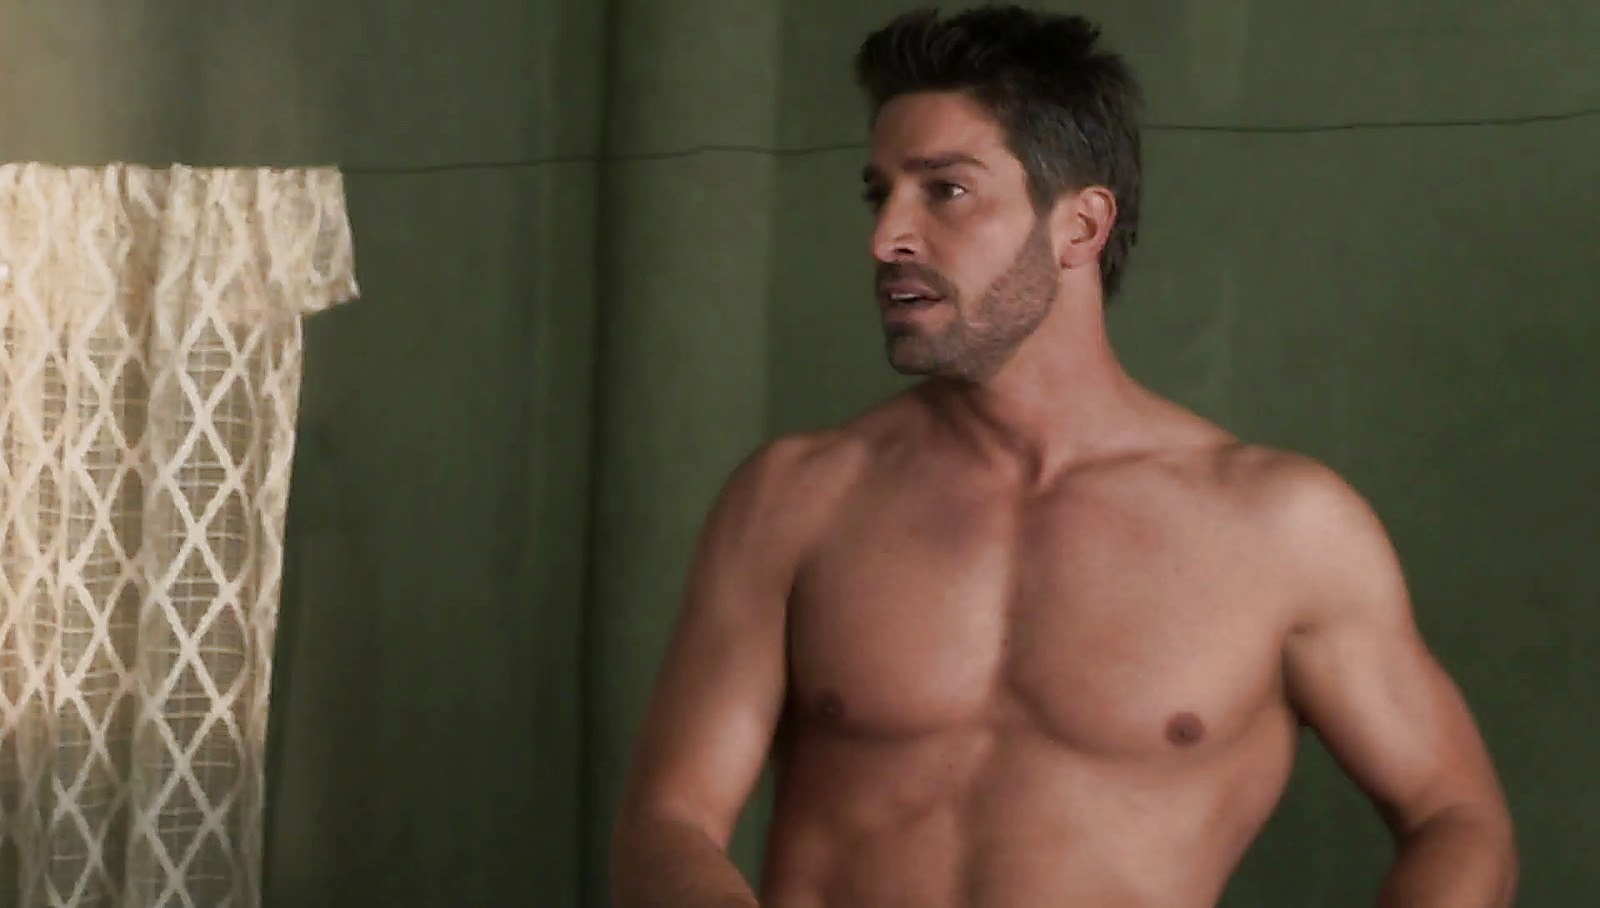 David Chocarro sexy shirtless scene March 1, 2017, 1pm